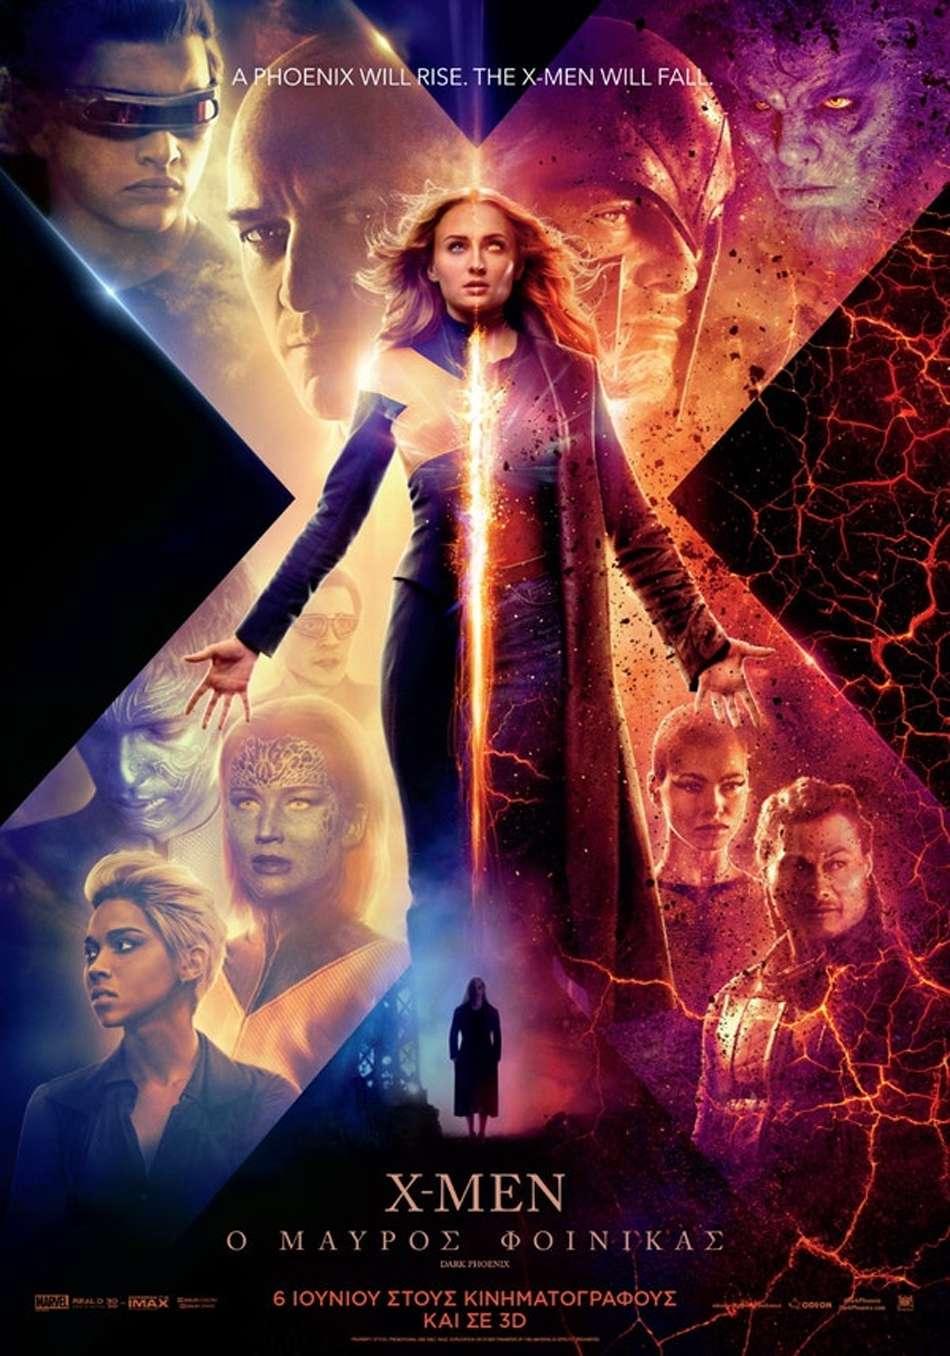 X-Men: Ο Μαύρος Φοίνικας (X-Men: Dark Phoenix) Poster Πόστερ